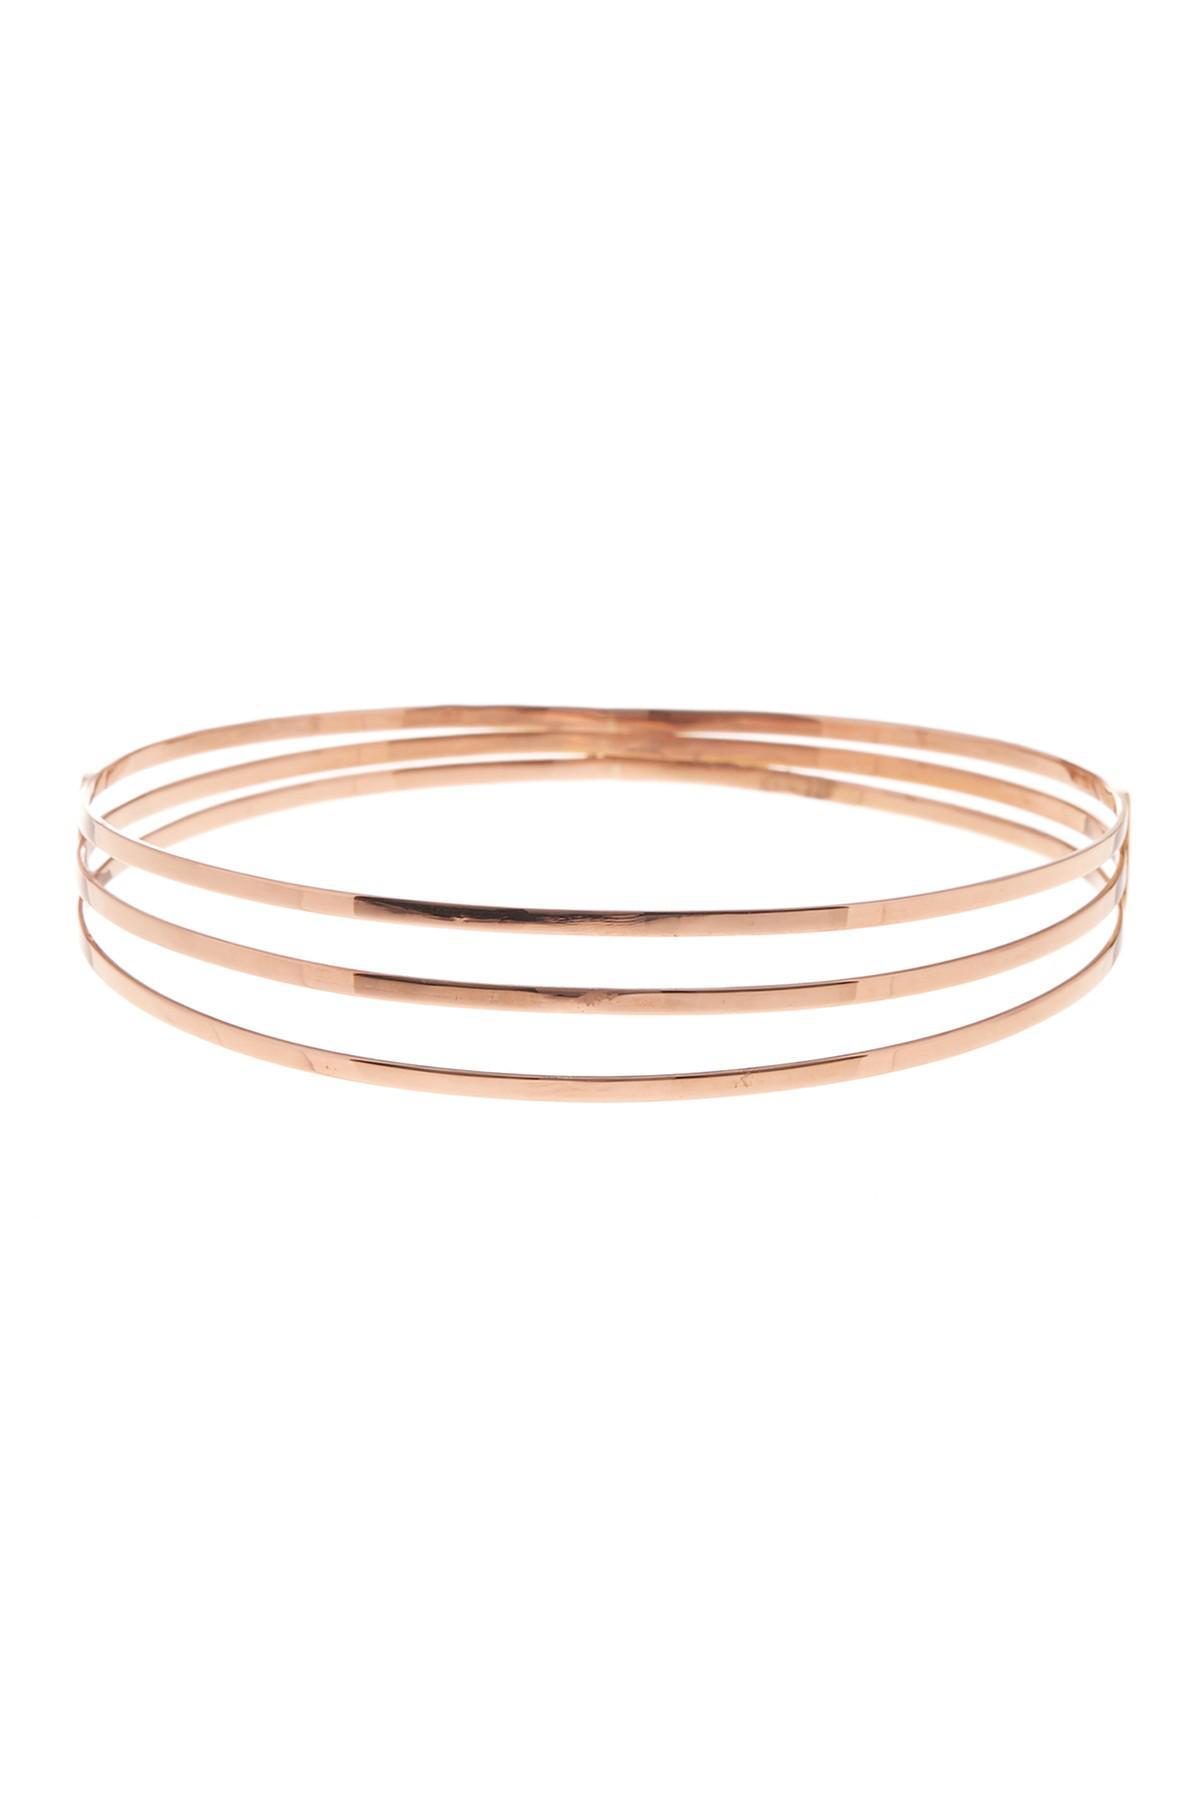 Lana Jewelry 14k Gold Alias Cross Curve Bubble Cuff Bangle xKEMYF6N